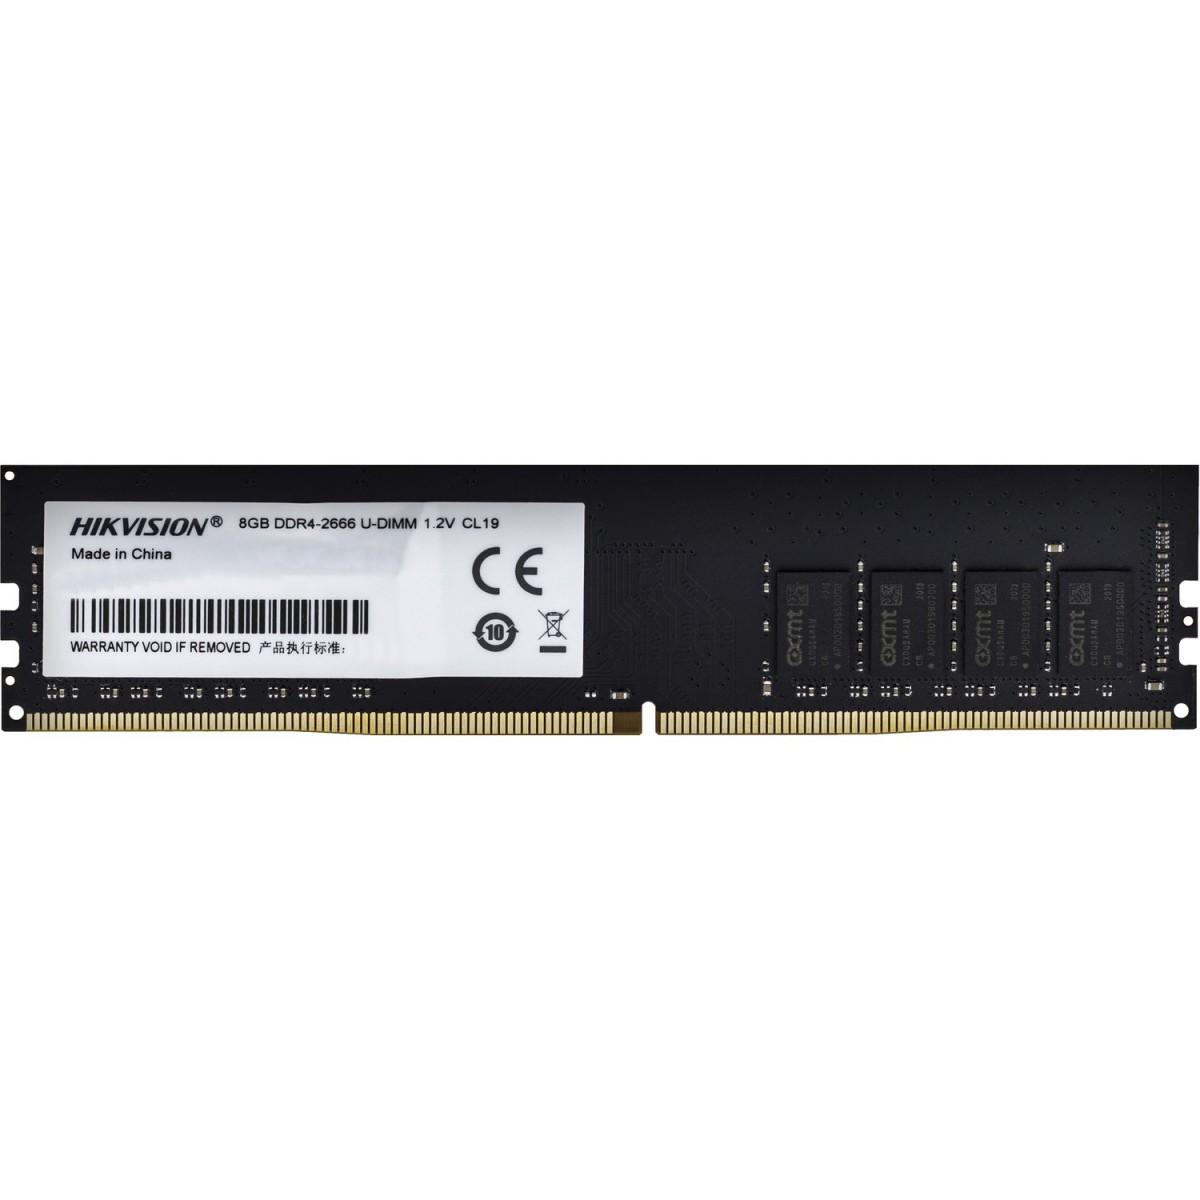 Memória DDR4 Hikvision, 8GB 2666MHz, HKED4081CBA1D0ZA1/8G